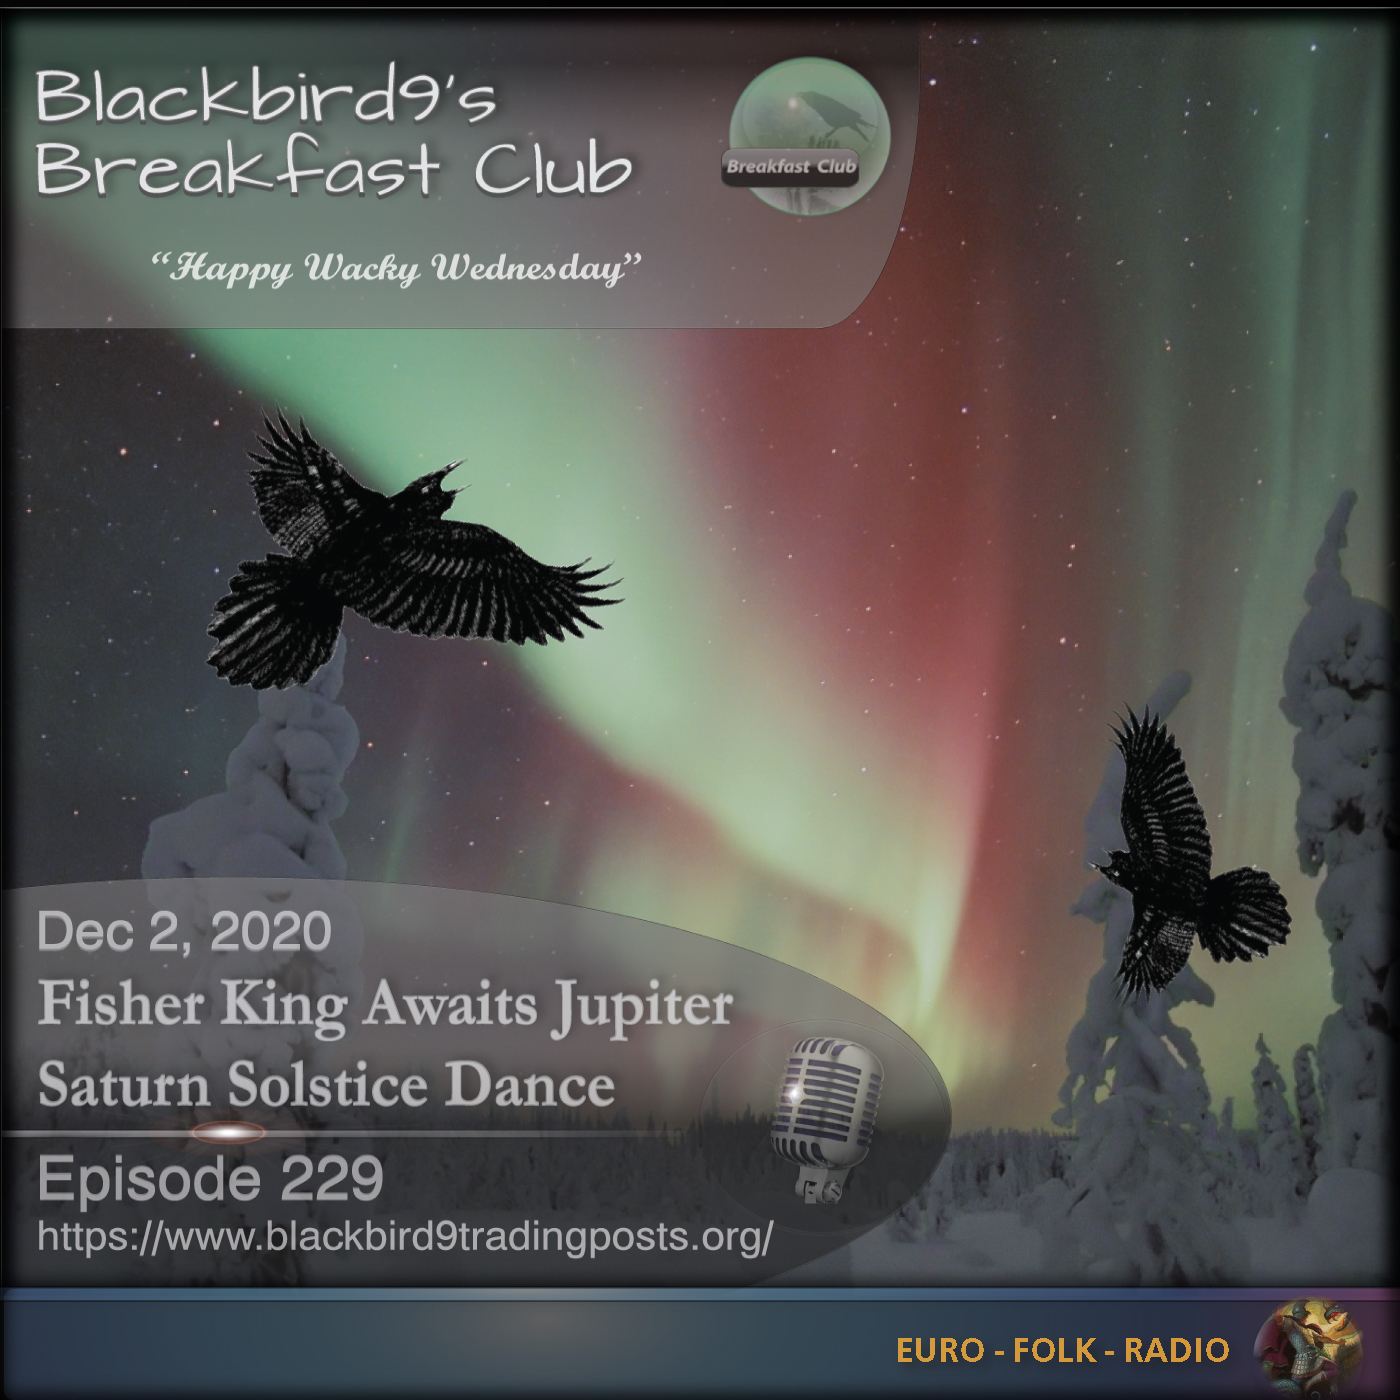 Blackbird9's Breakfast Club – (229) Fisher King Awaits Jupiter Saturn Solstice Dance